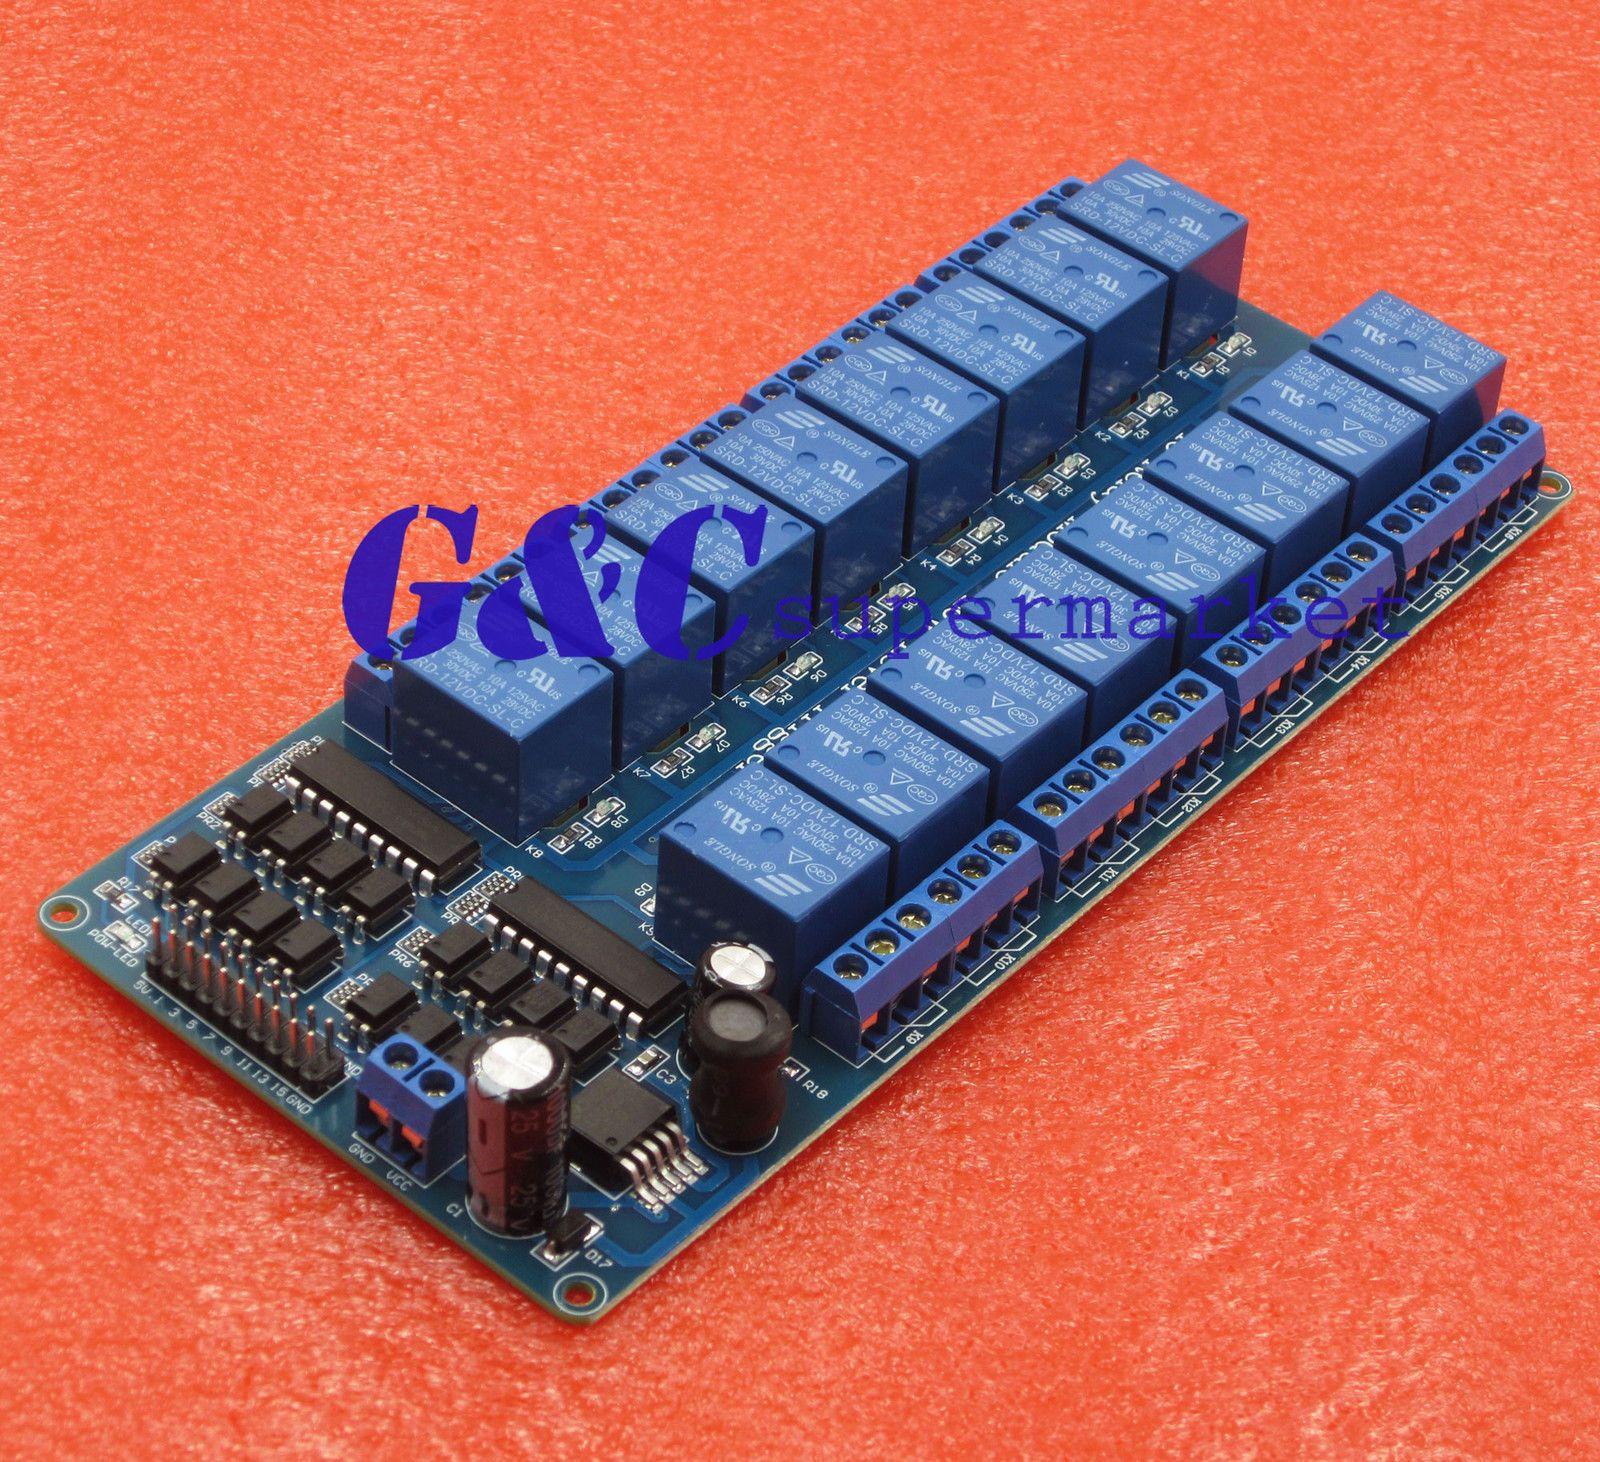 $12 58 - 16-Channel 12V Relay Shield Module Wiht Optocoupler